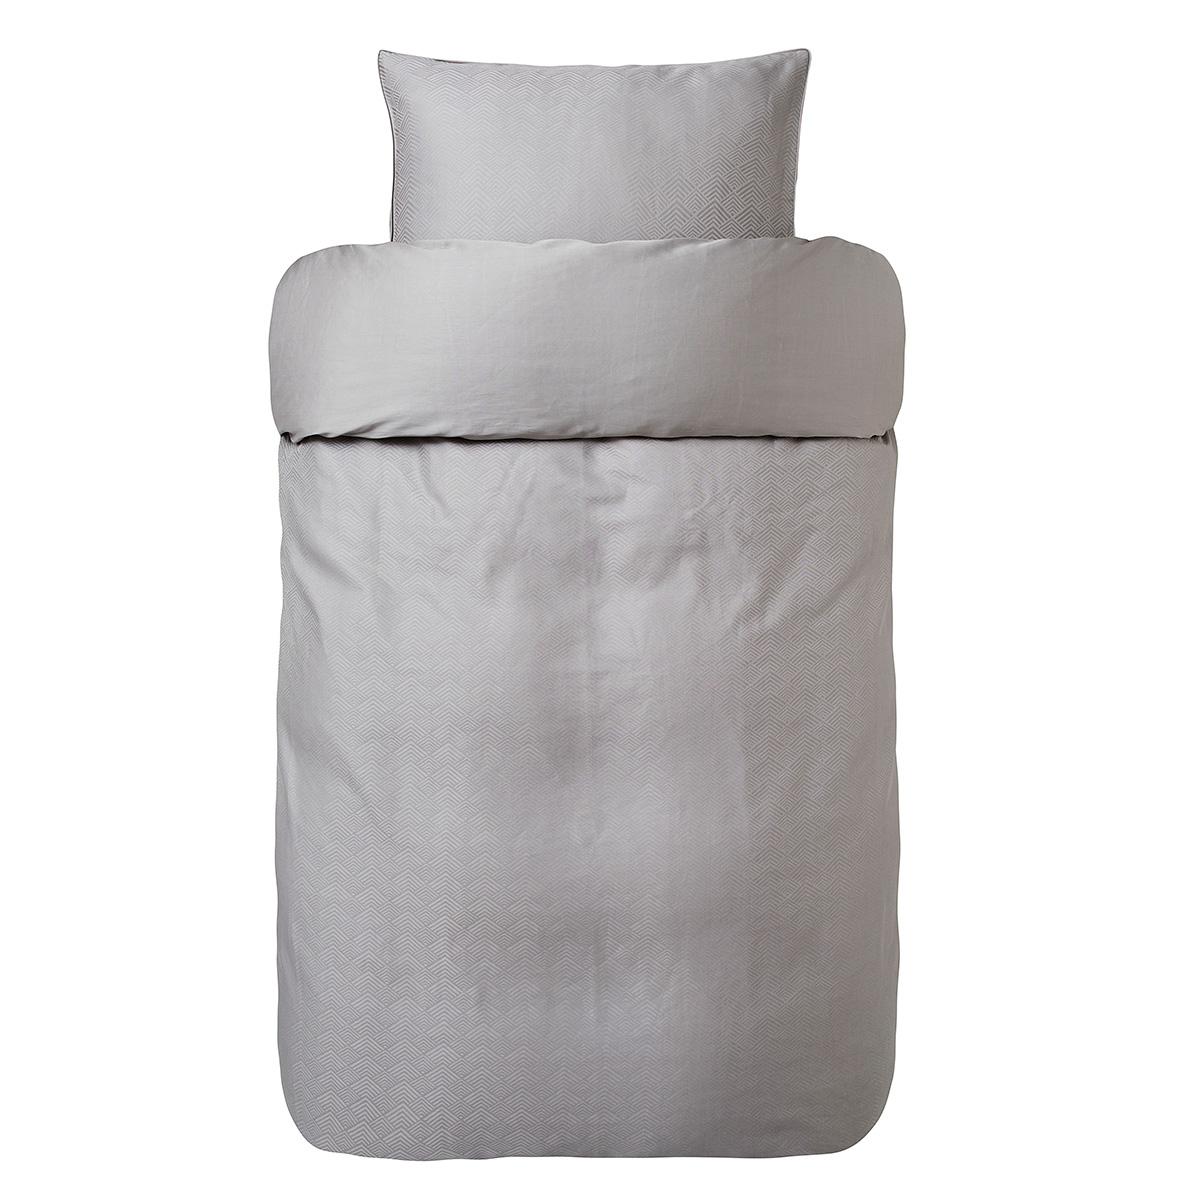 Høie sengetøj - Nobel - Grå